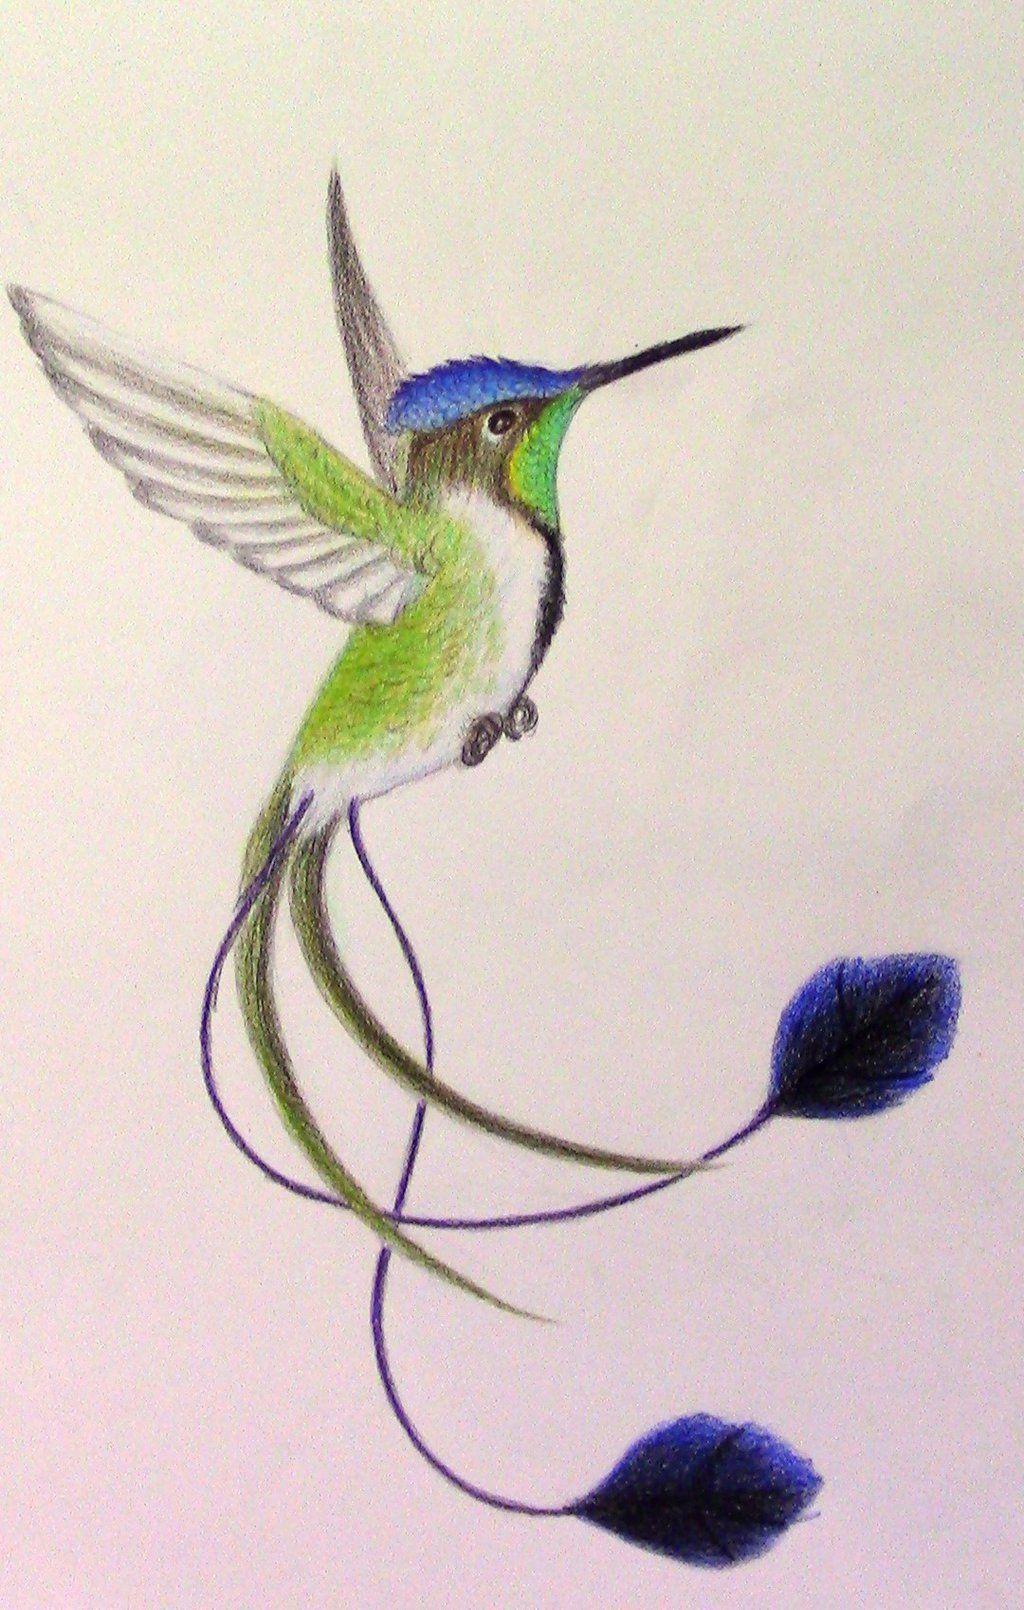 Spatuletail Hummingbird Google Search тату колибри рисунок